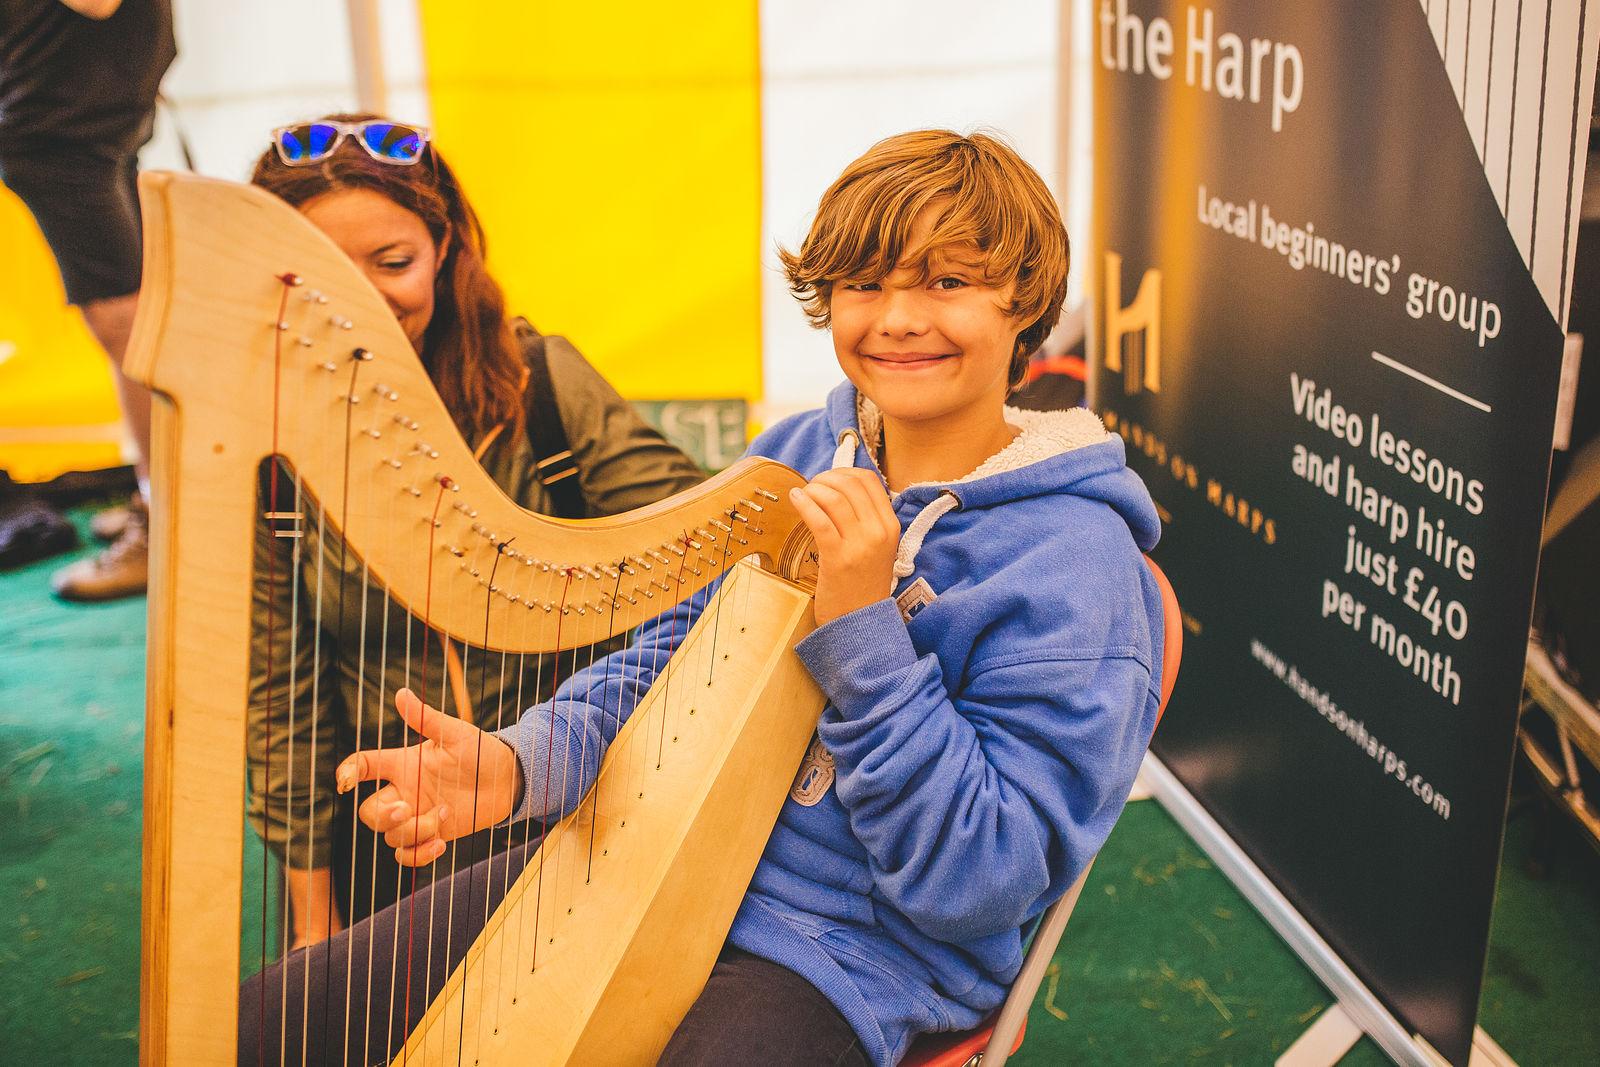 Harp Workshop